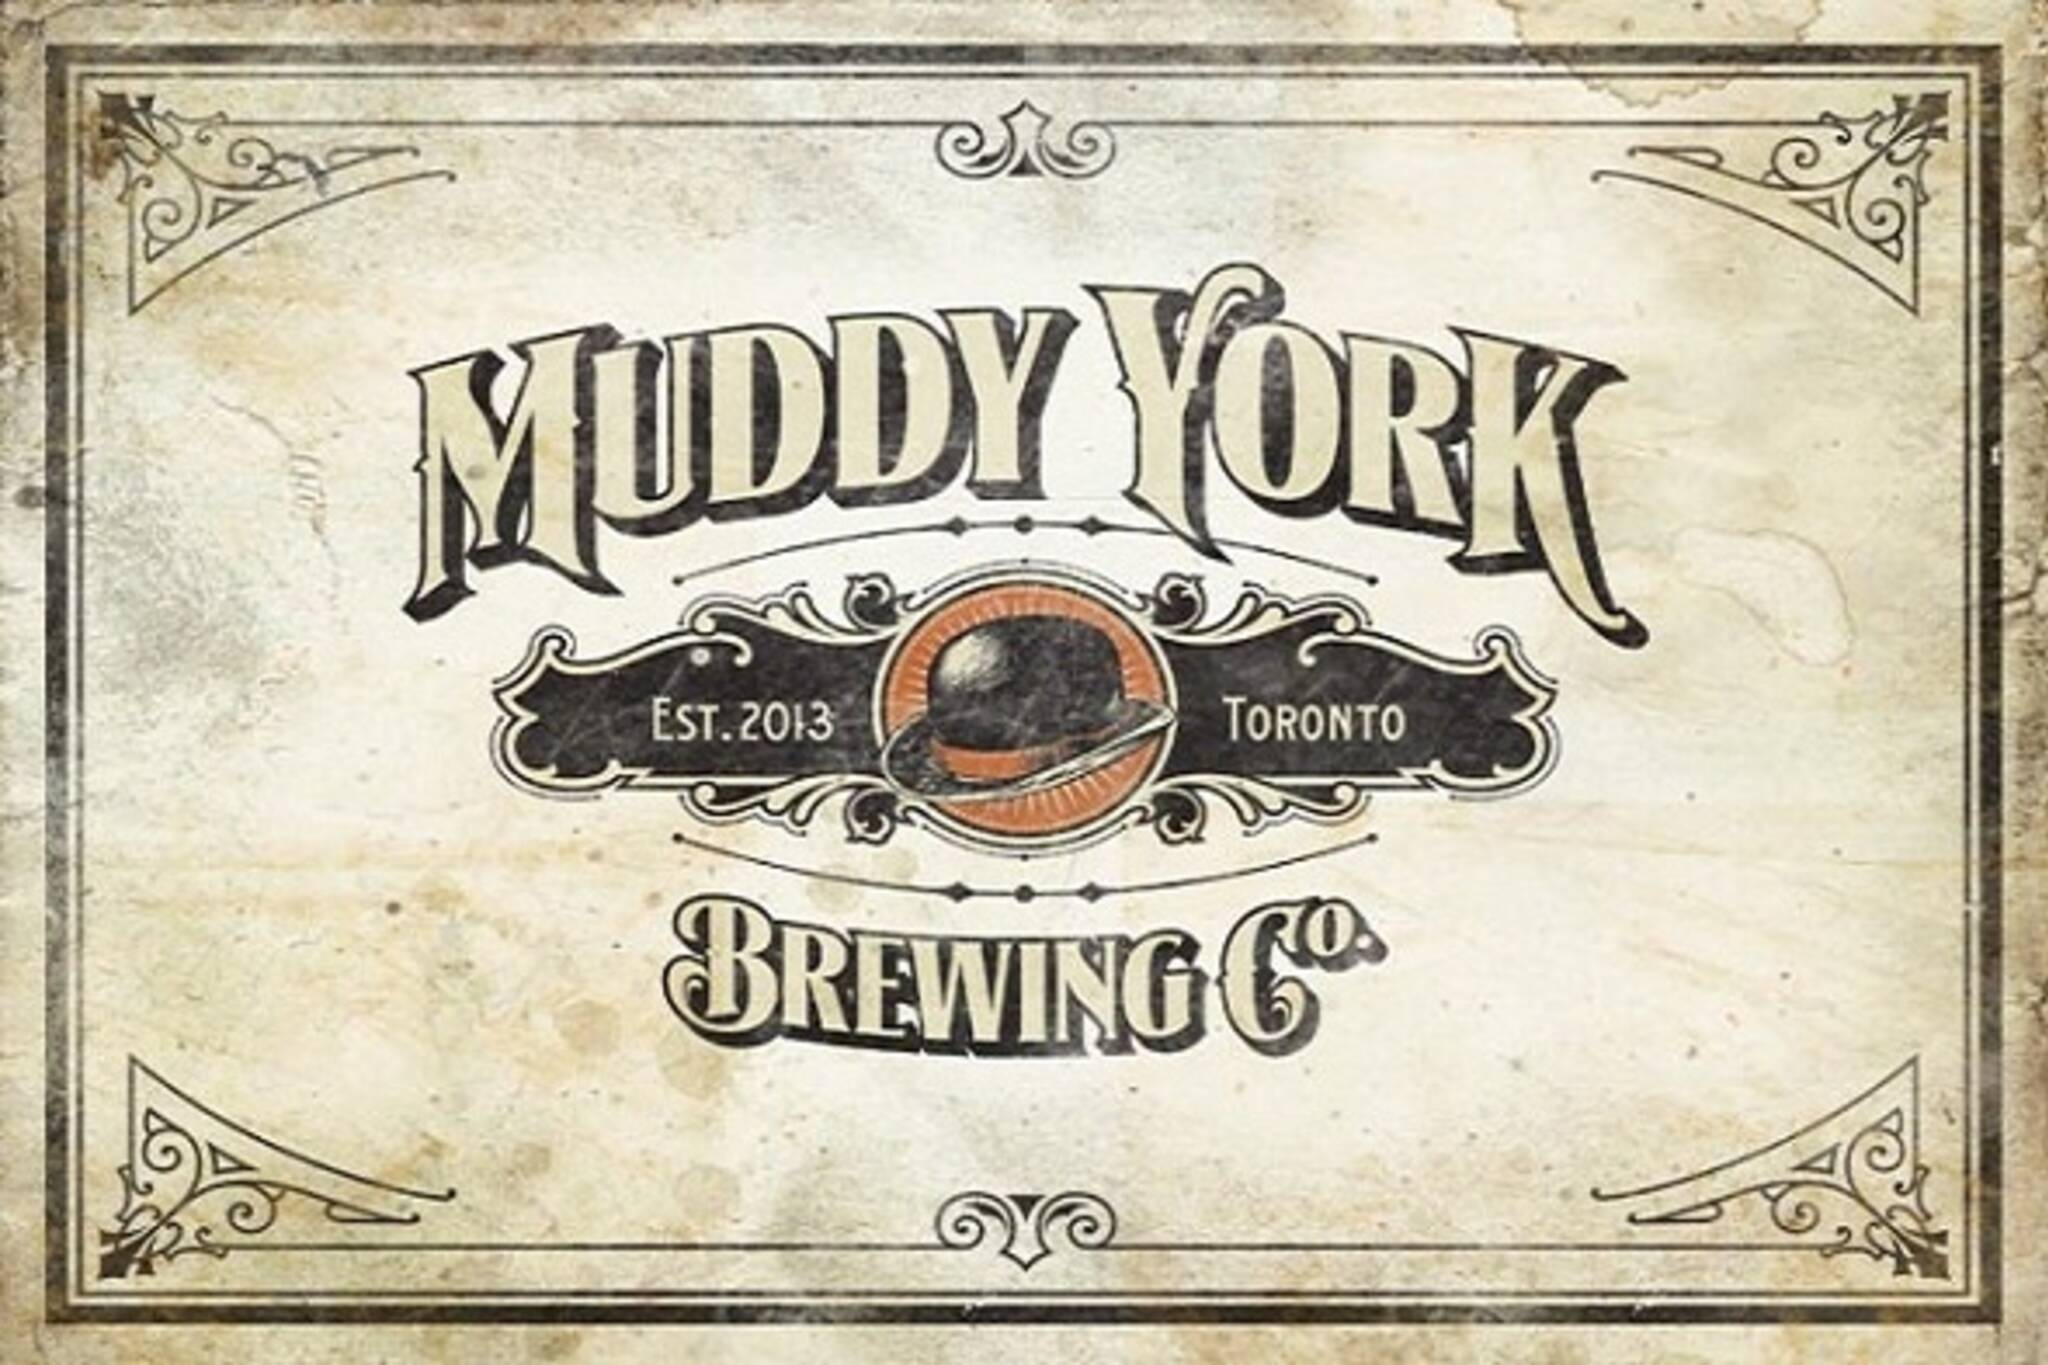 Muddy York Brewery